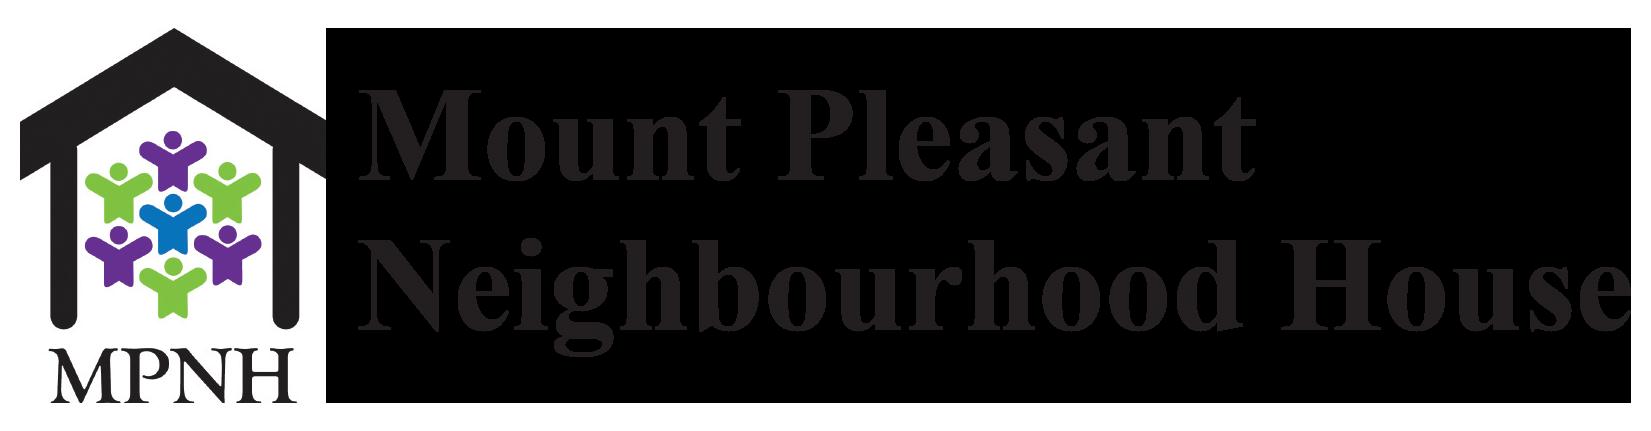 mpnh-logo.png